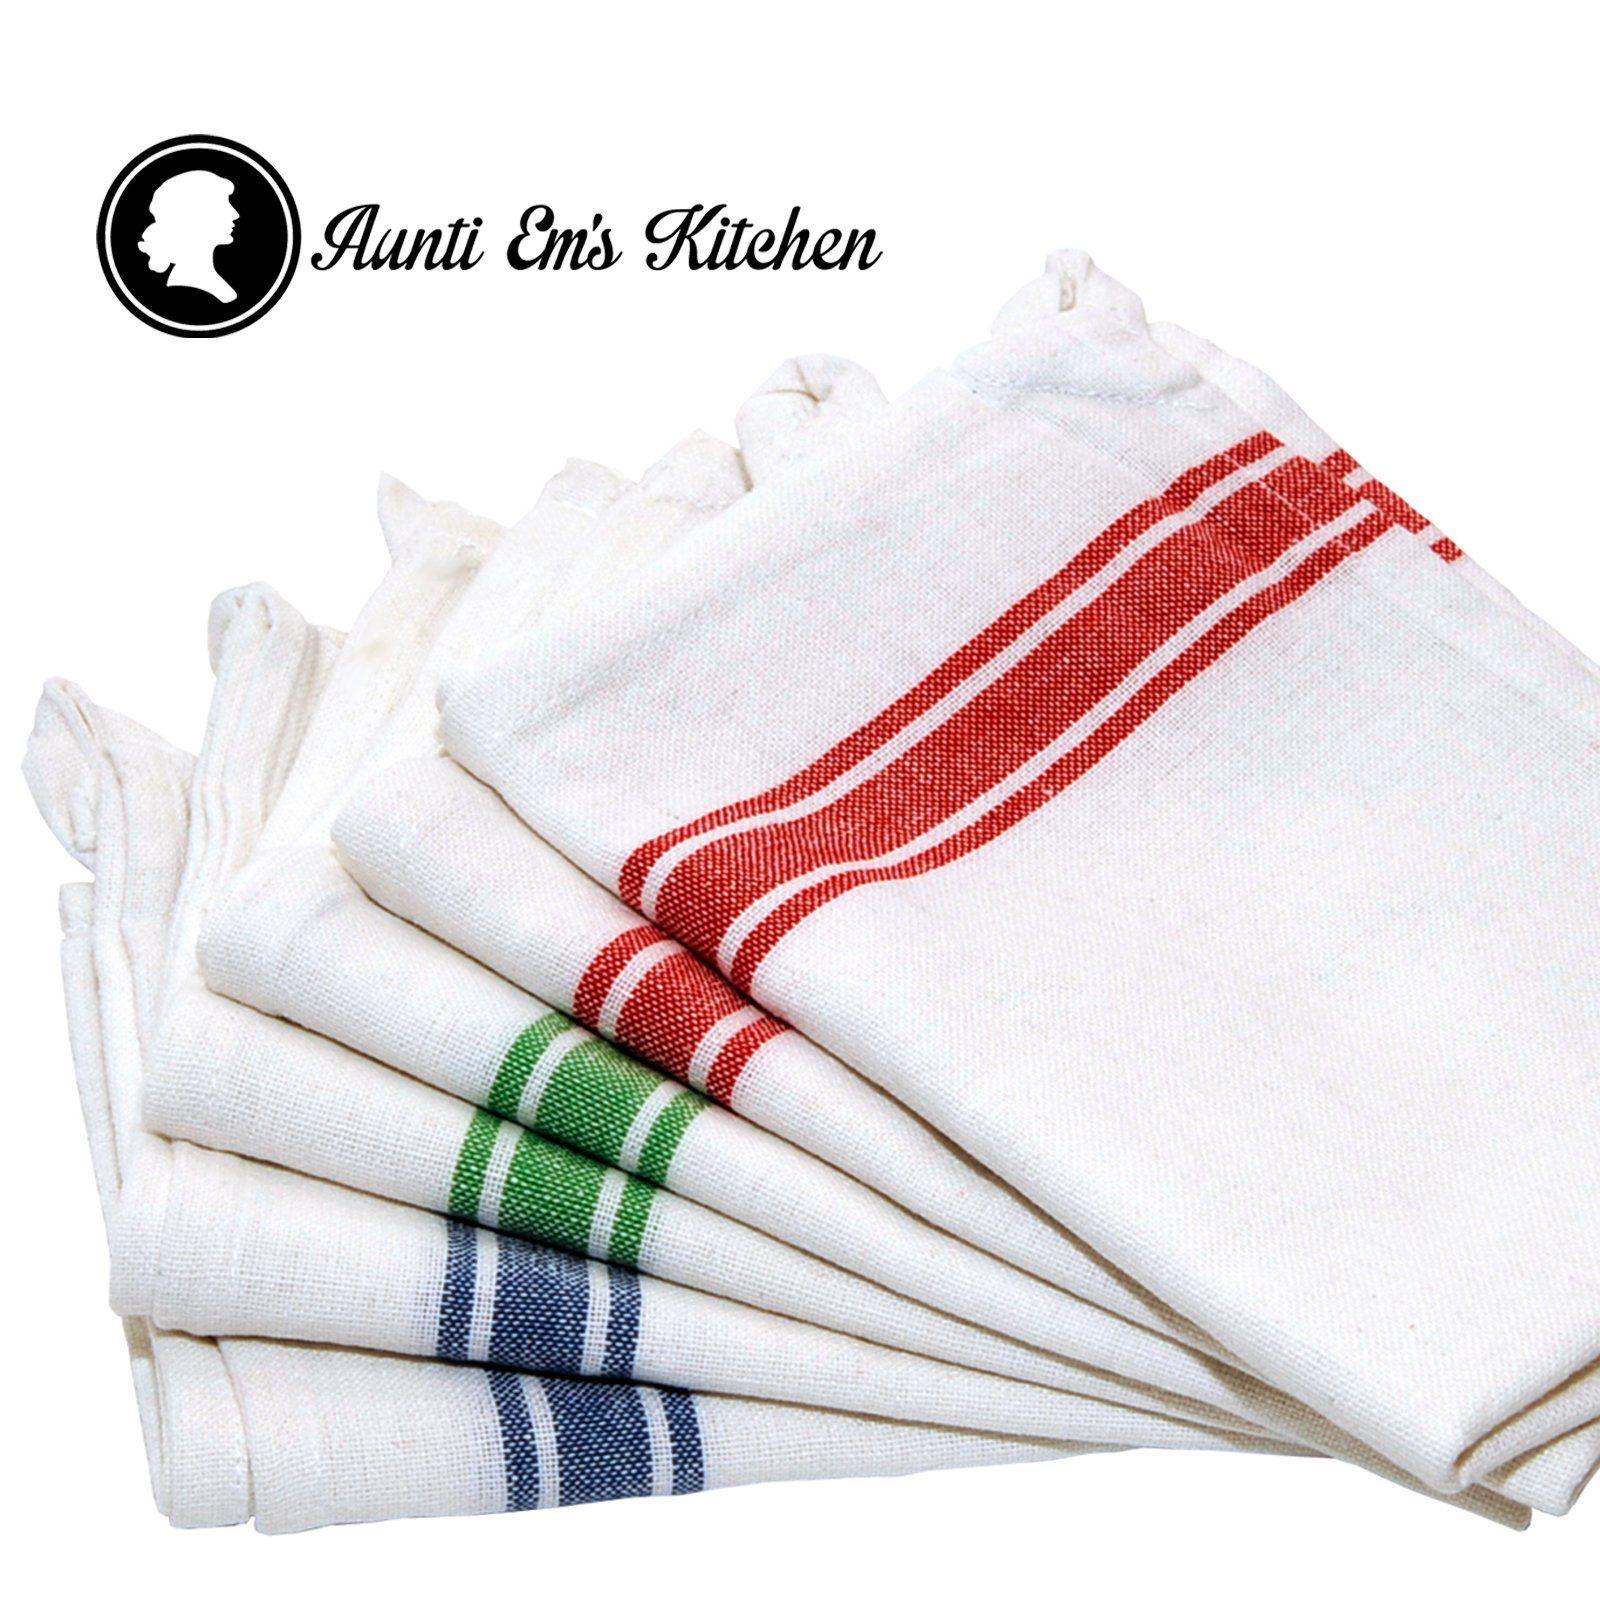 Kitchen Dish Towels With Vintage Design, Super Absorbent 100% Natural  Cotton Kitchen Towels (